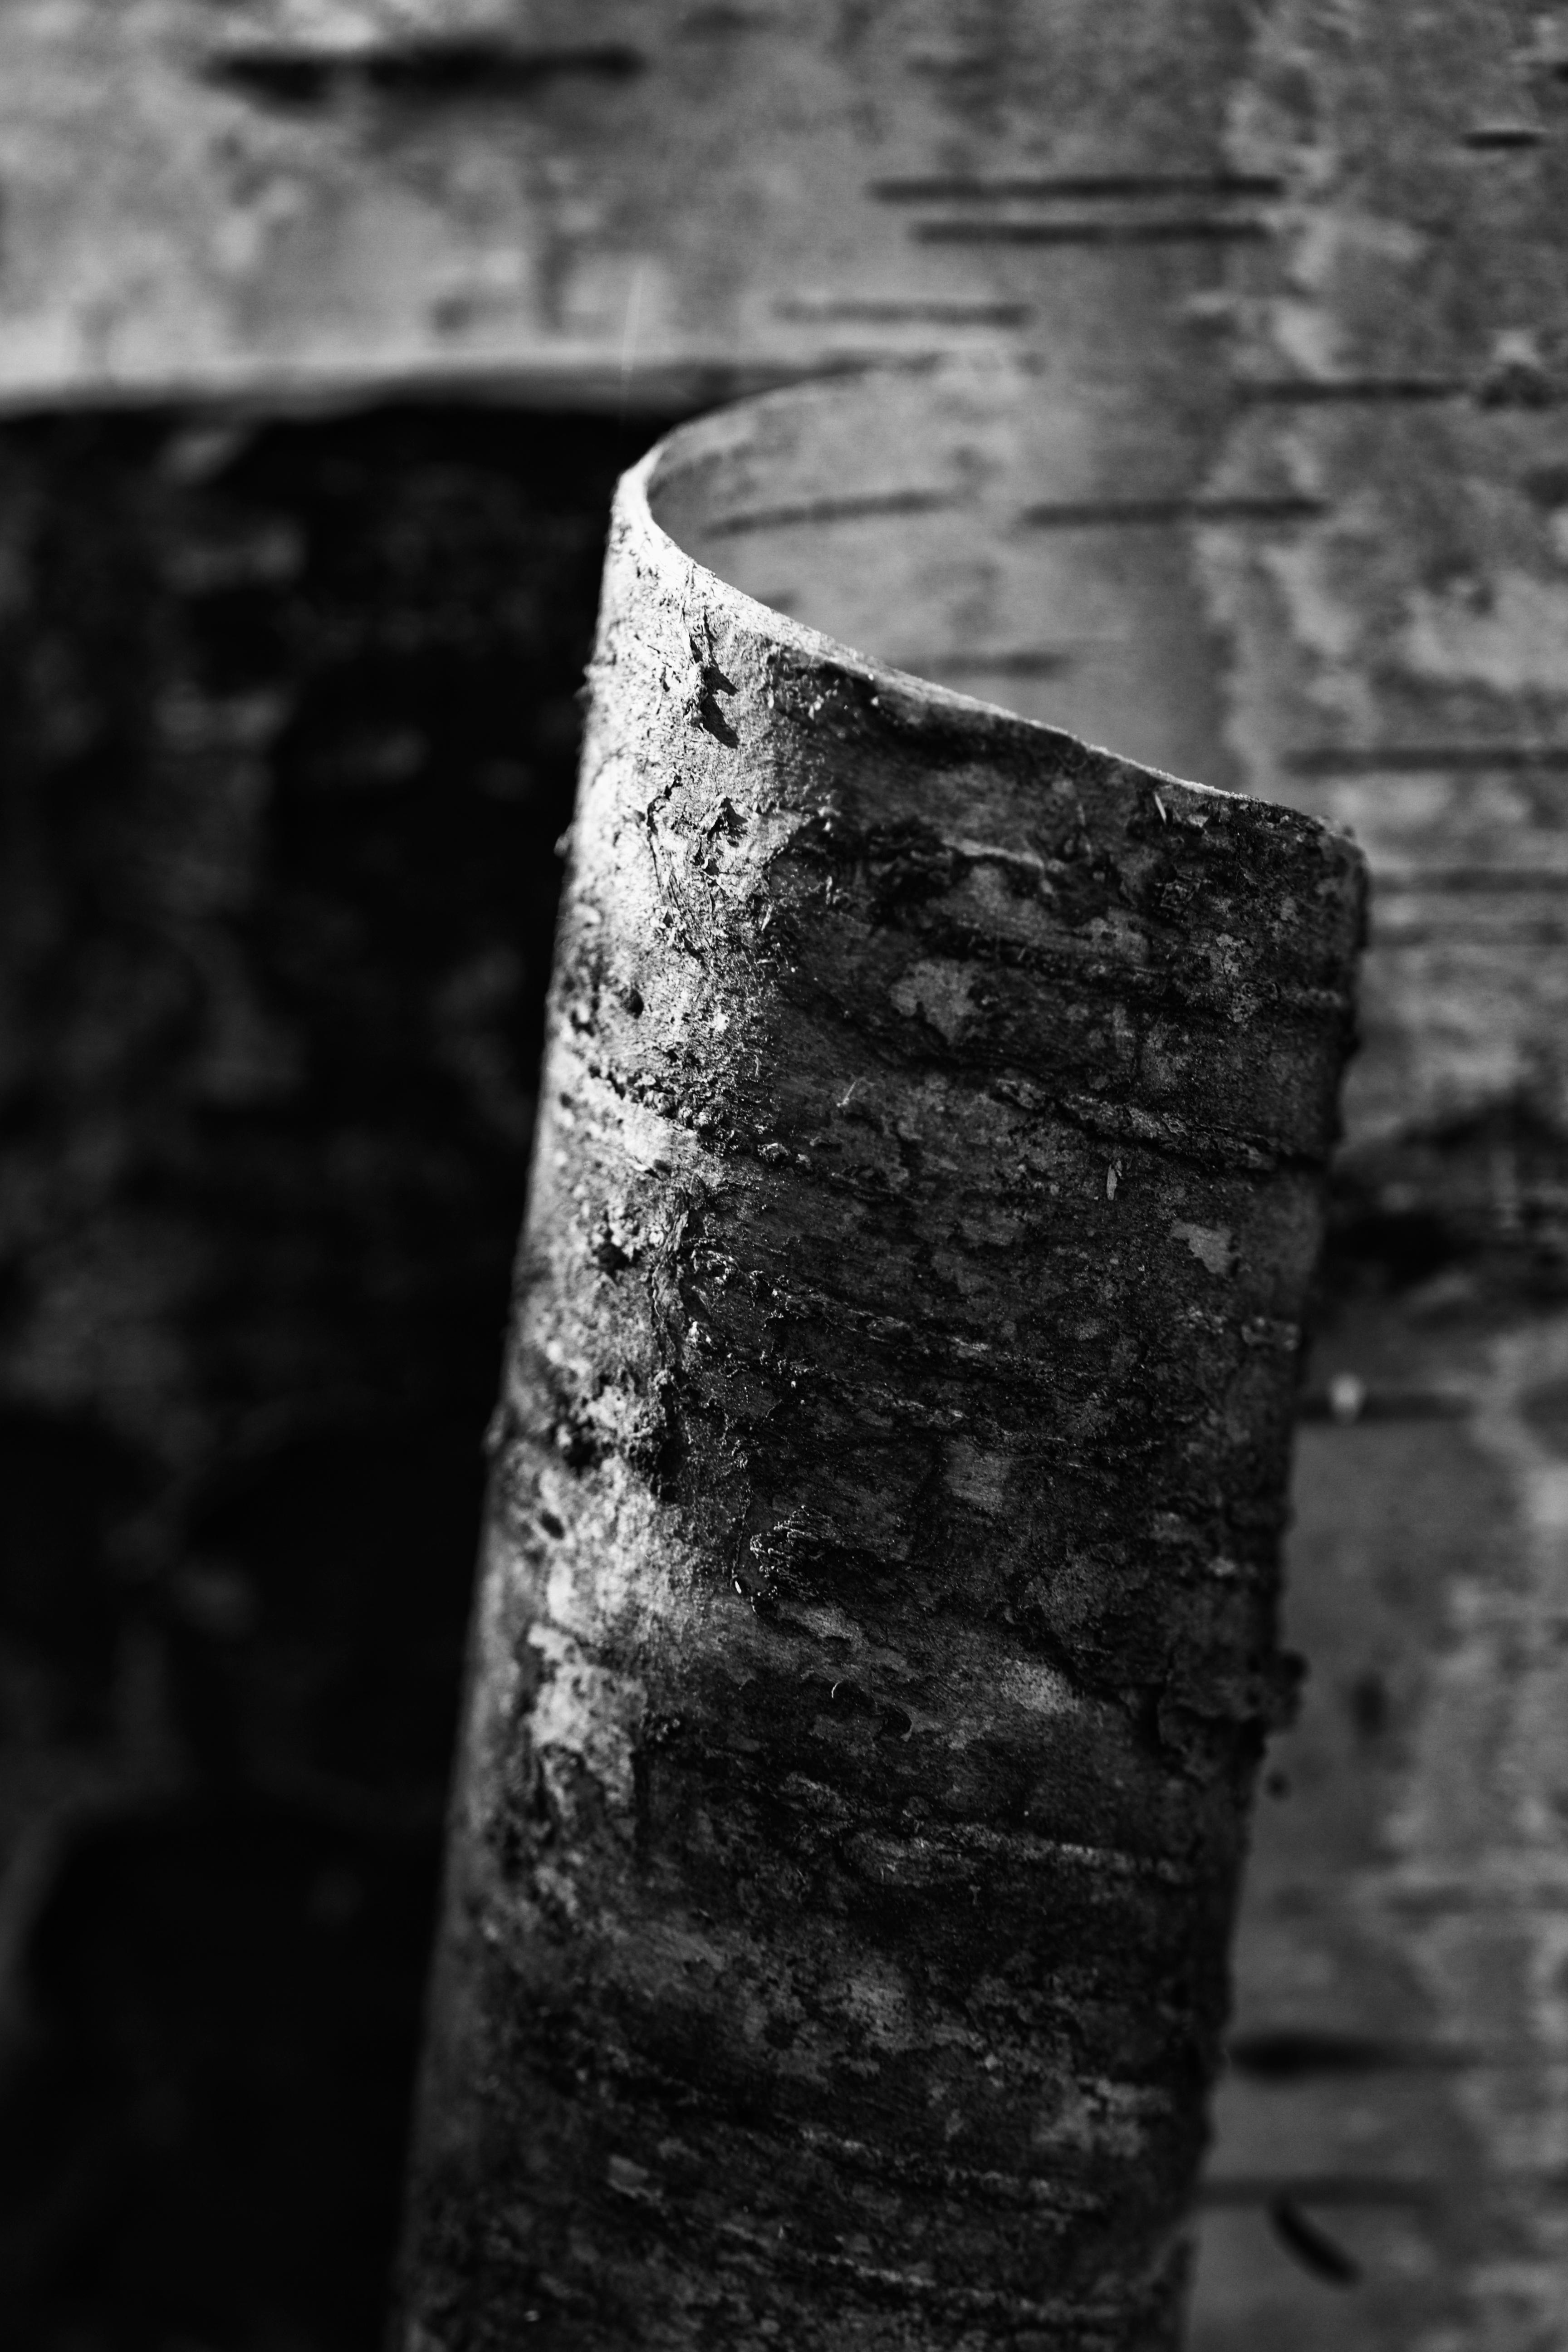 Curling bark